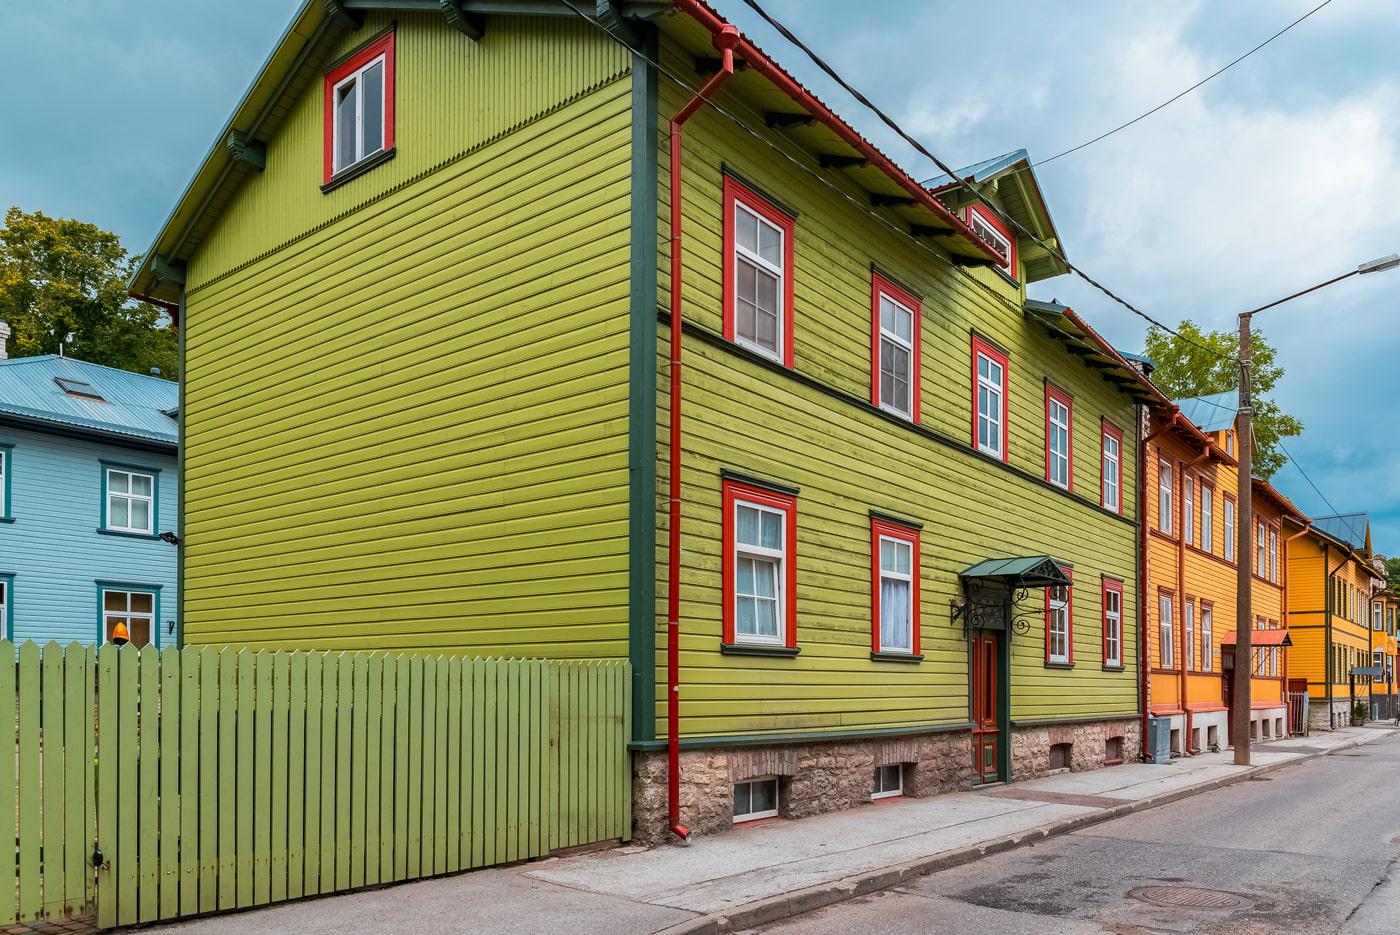 Wooden houses in Kalamaja, Tallinn